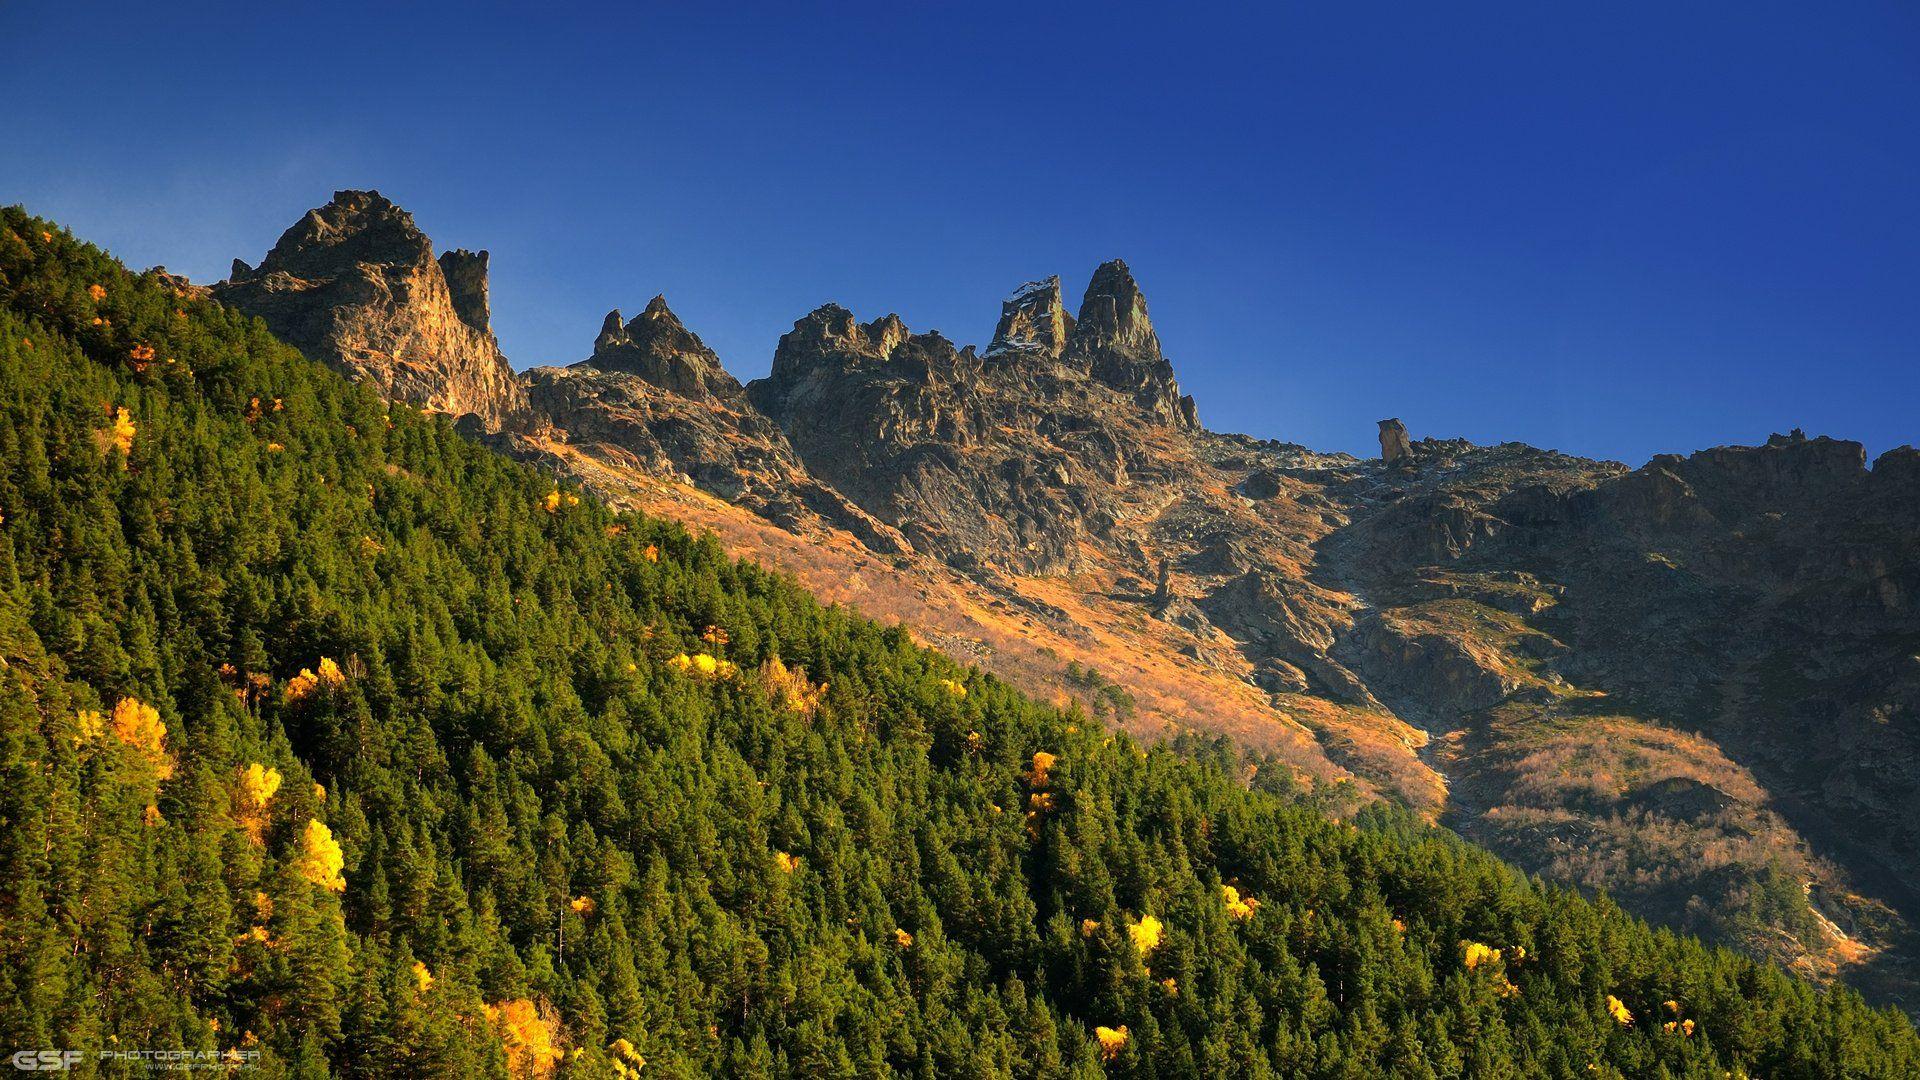 осень горы теберда скалы природа пейзаж, Serj Master